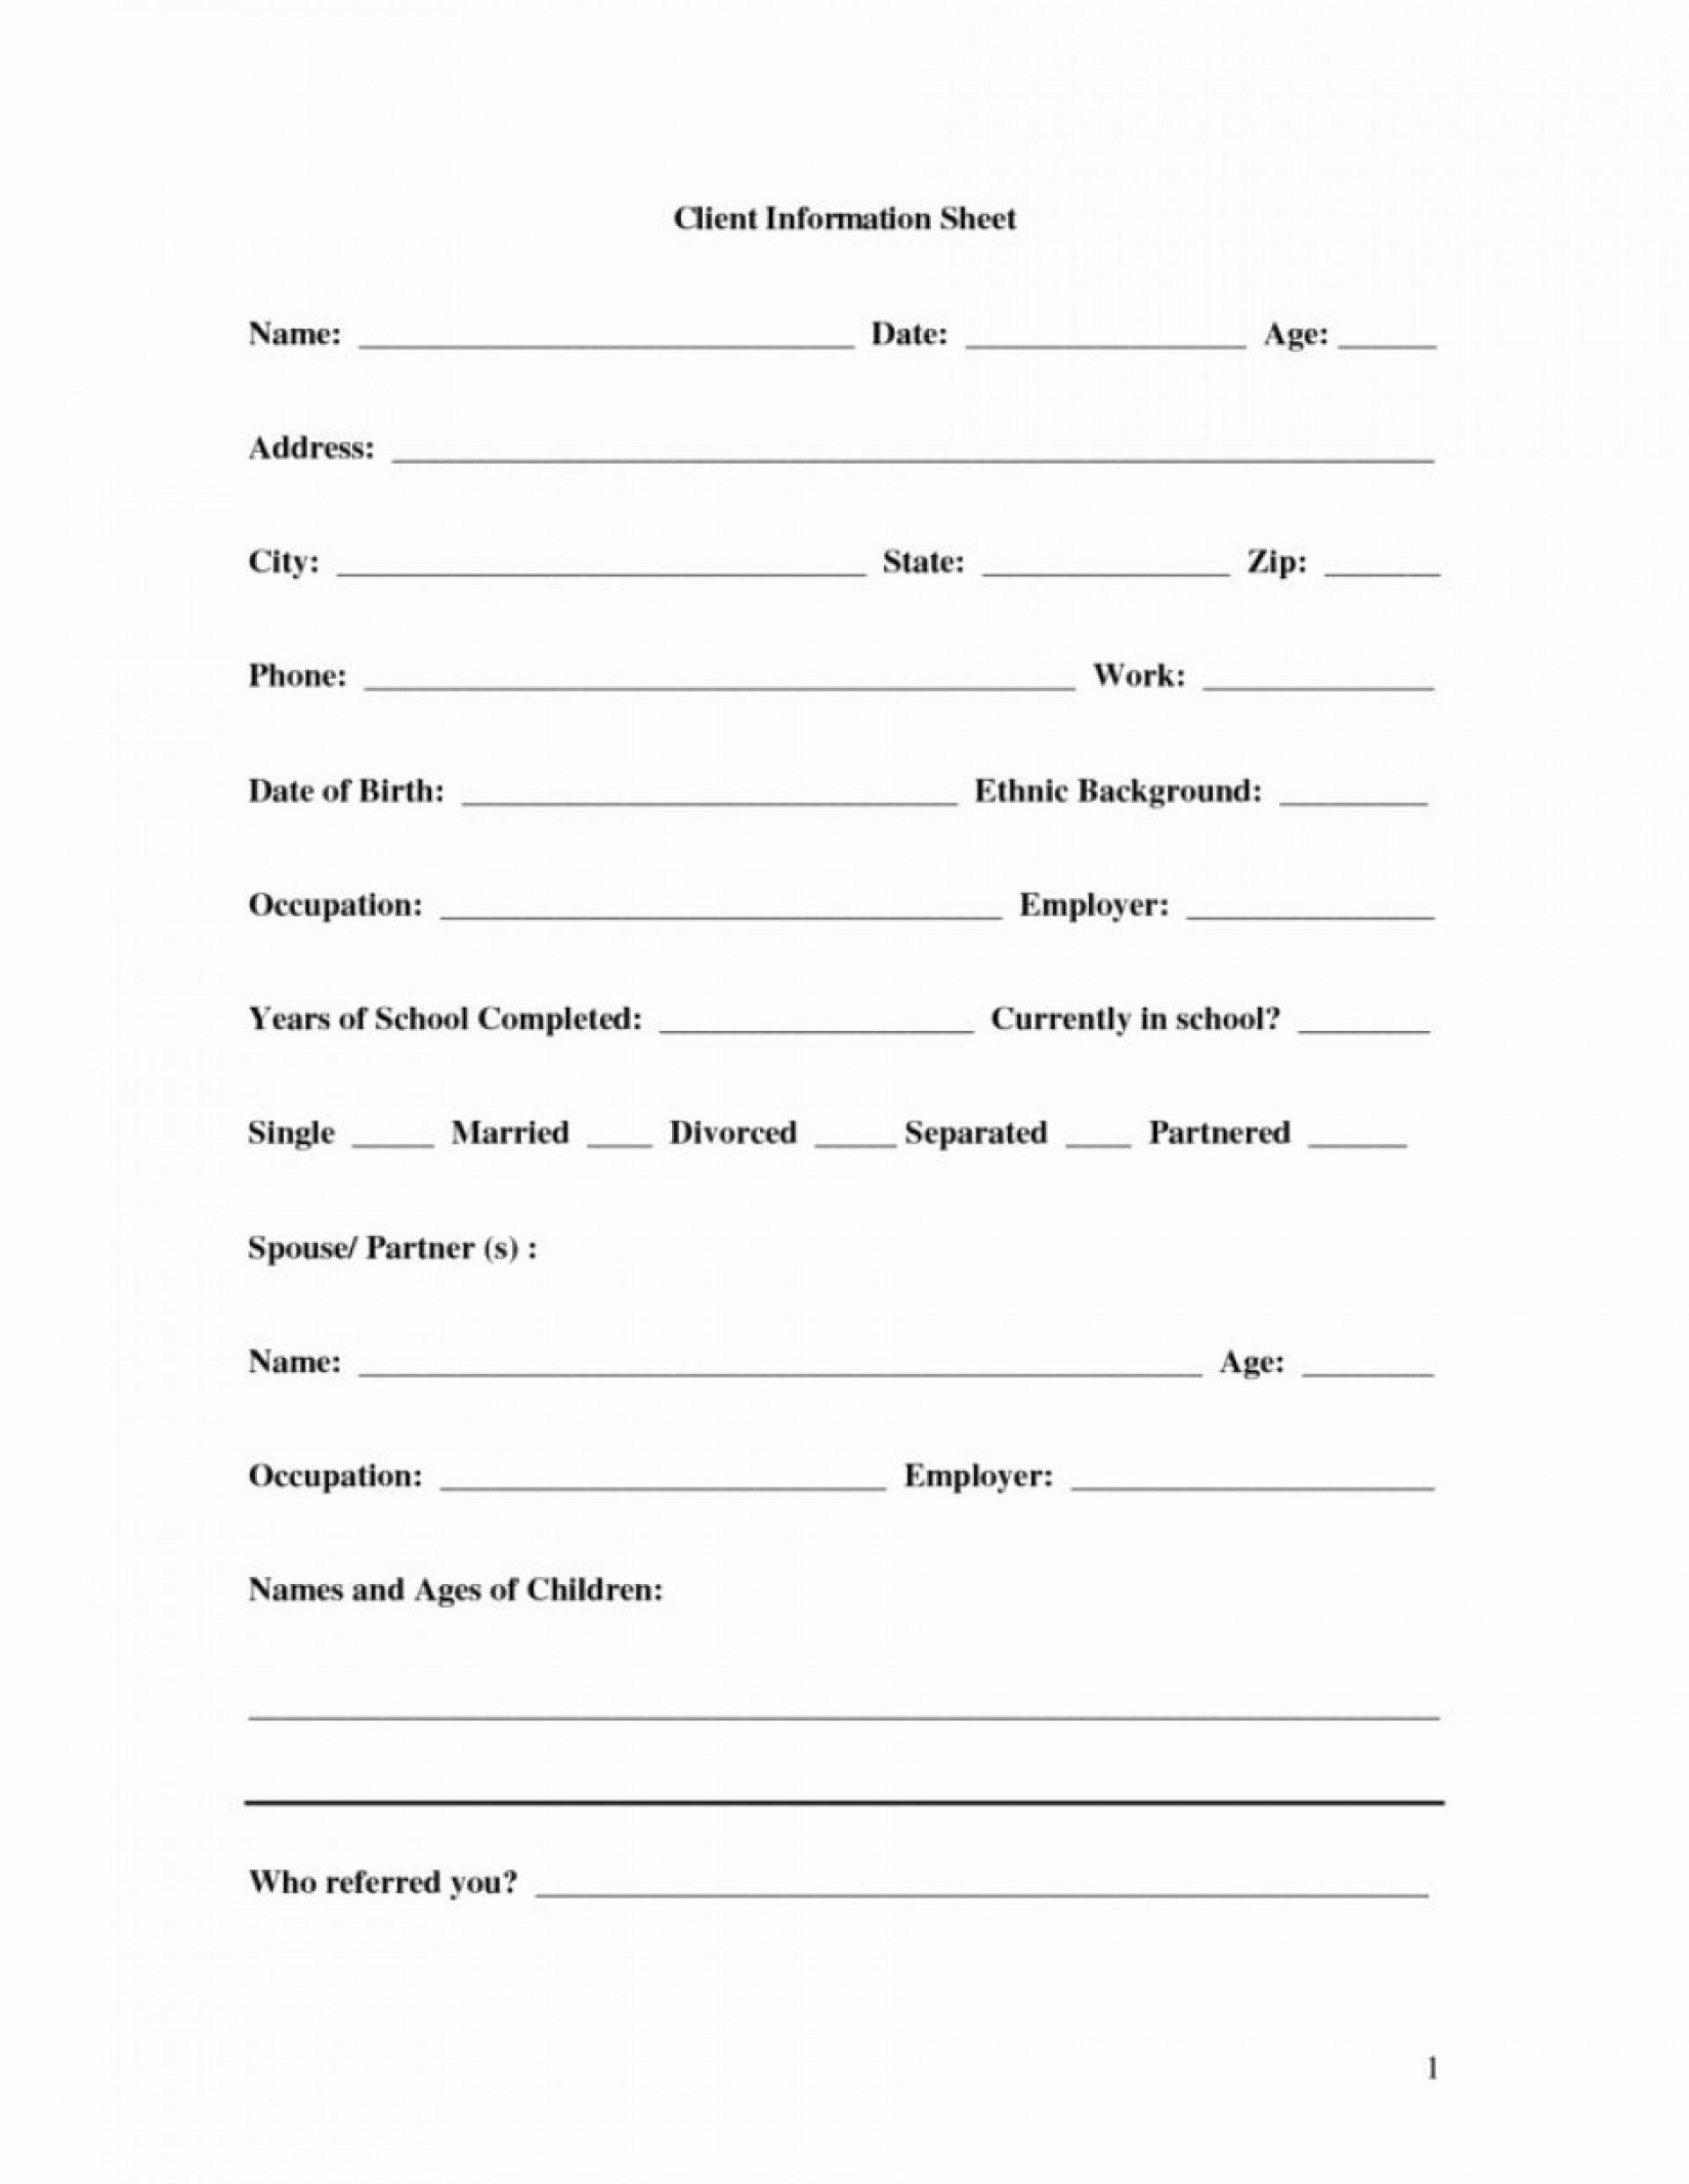 002 Breathtaking New Customer Form Template Word Design  Registration Account Feedback1920